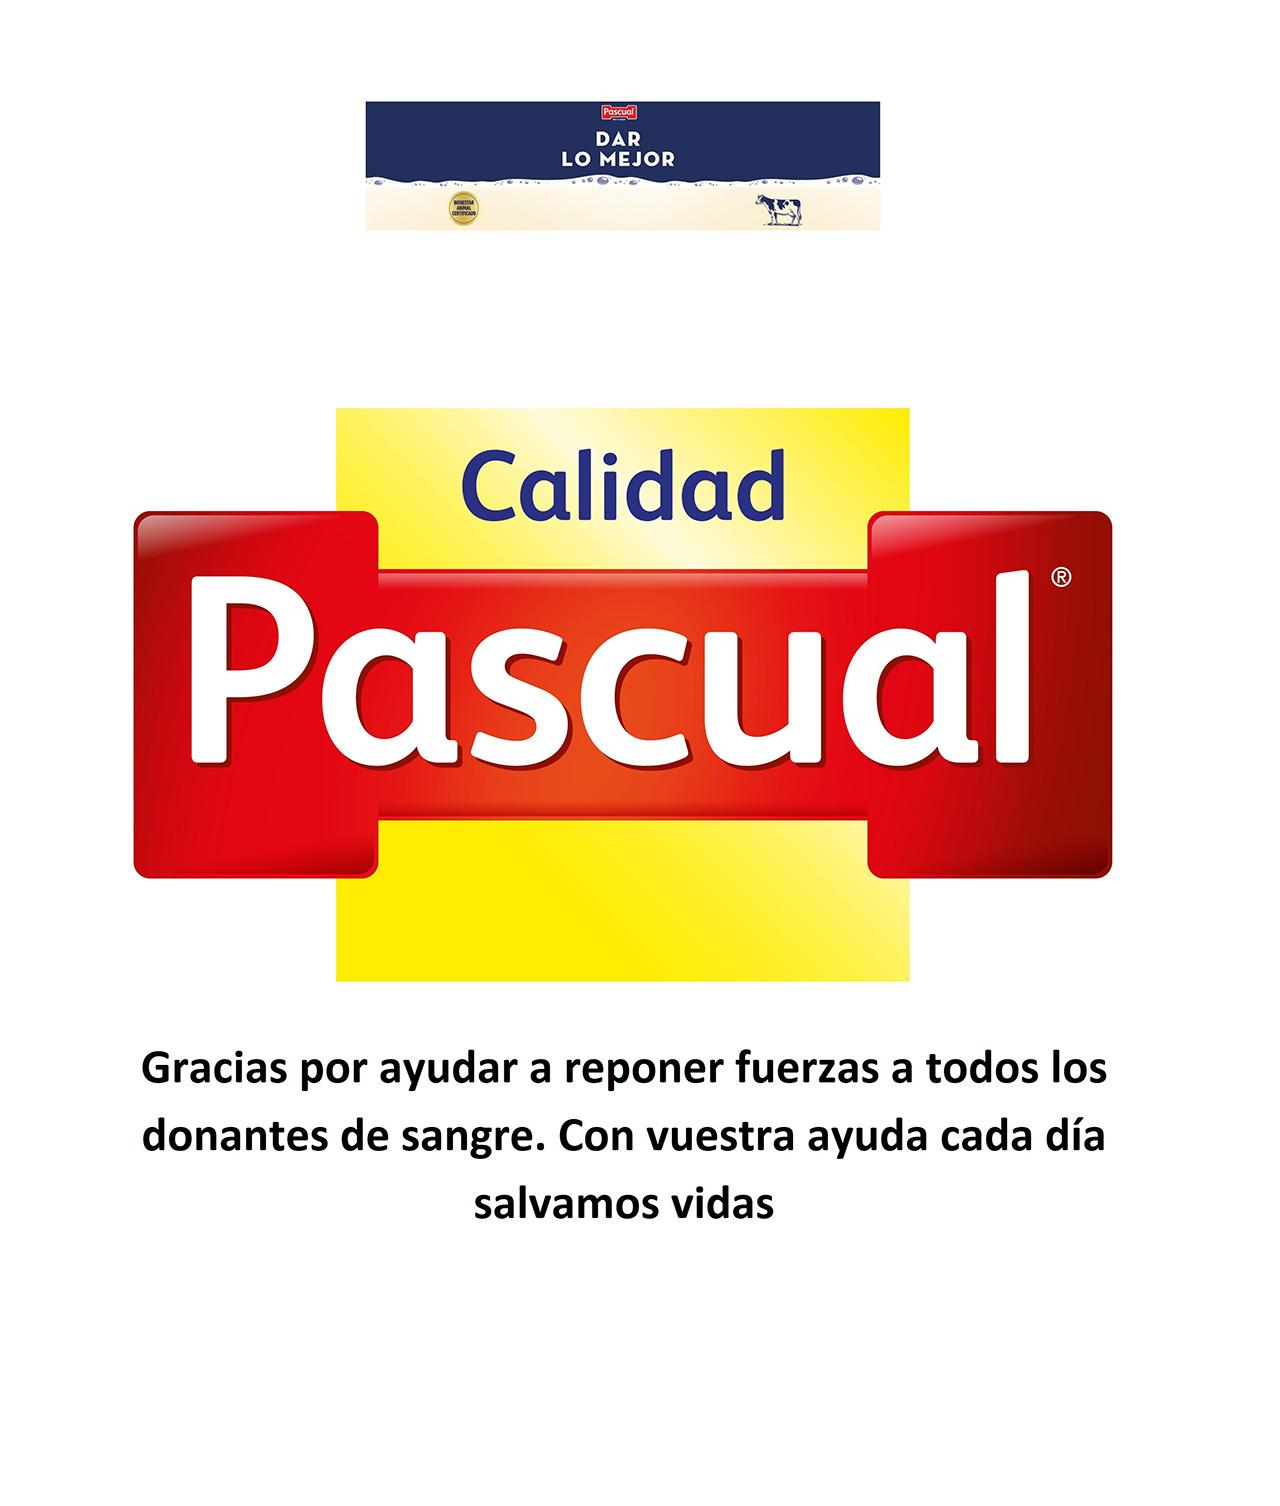 pascual-corregido